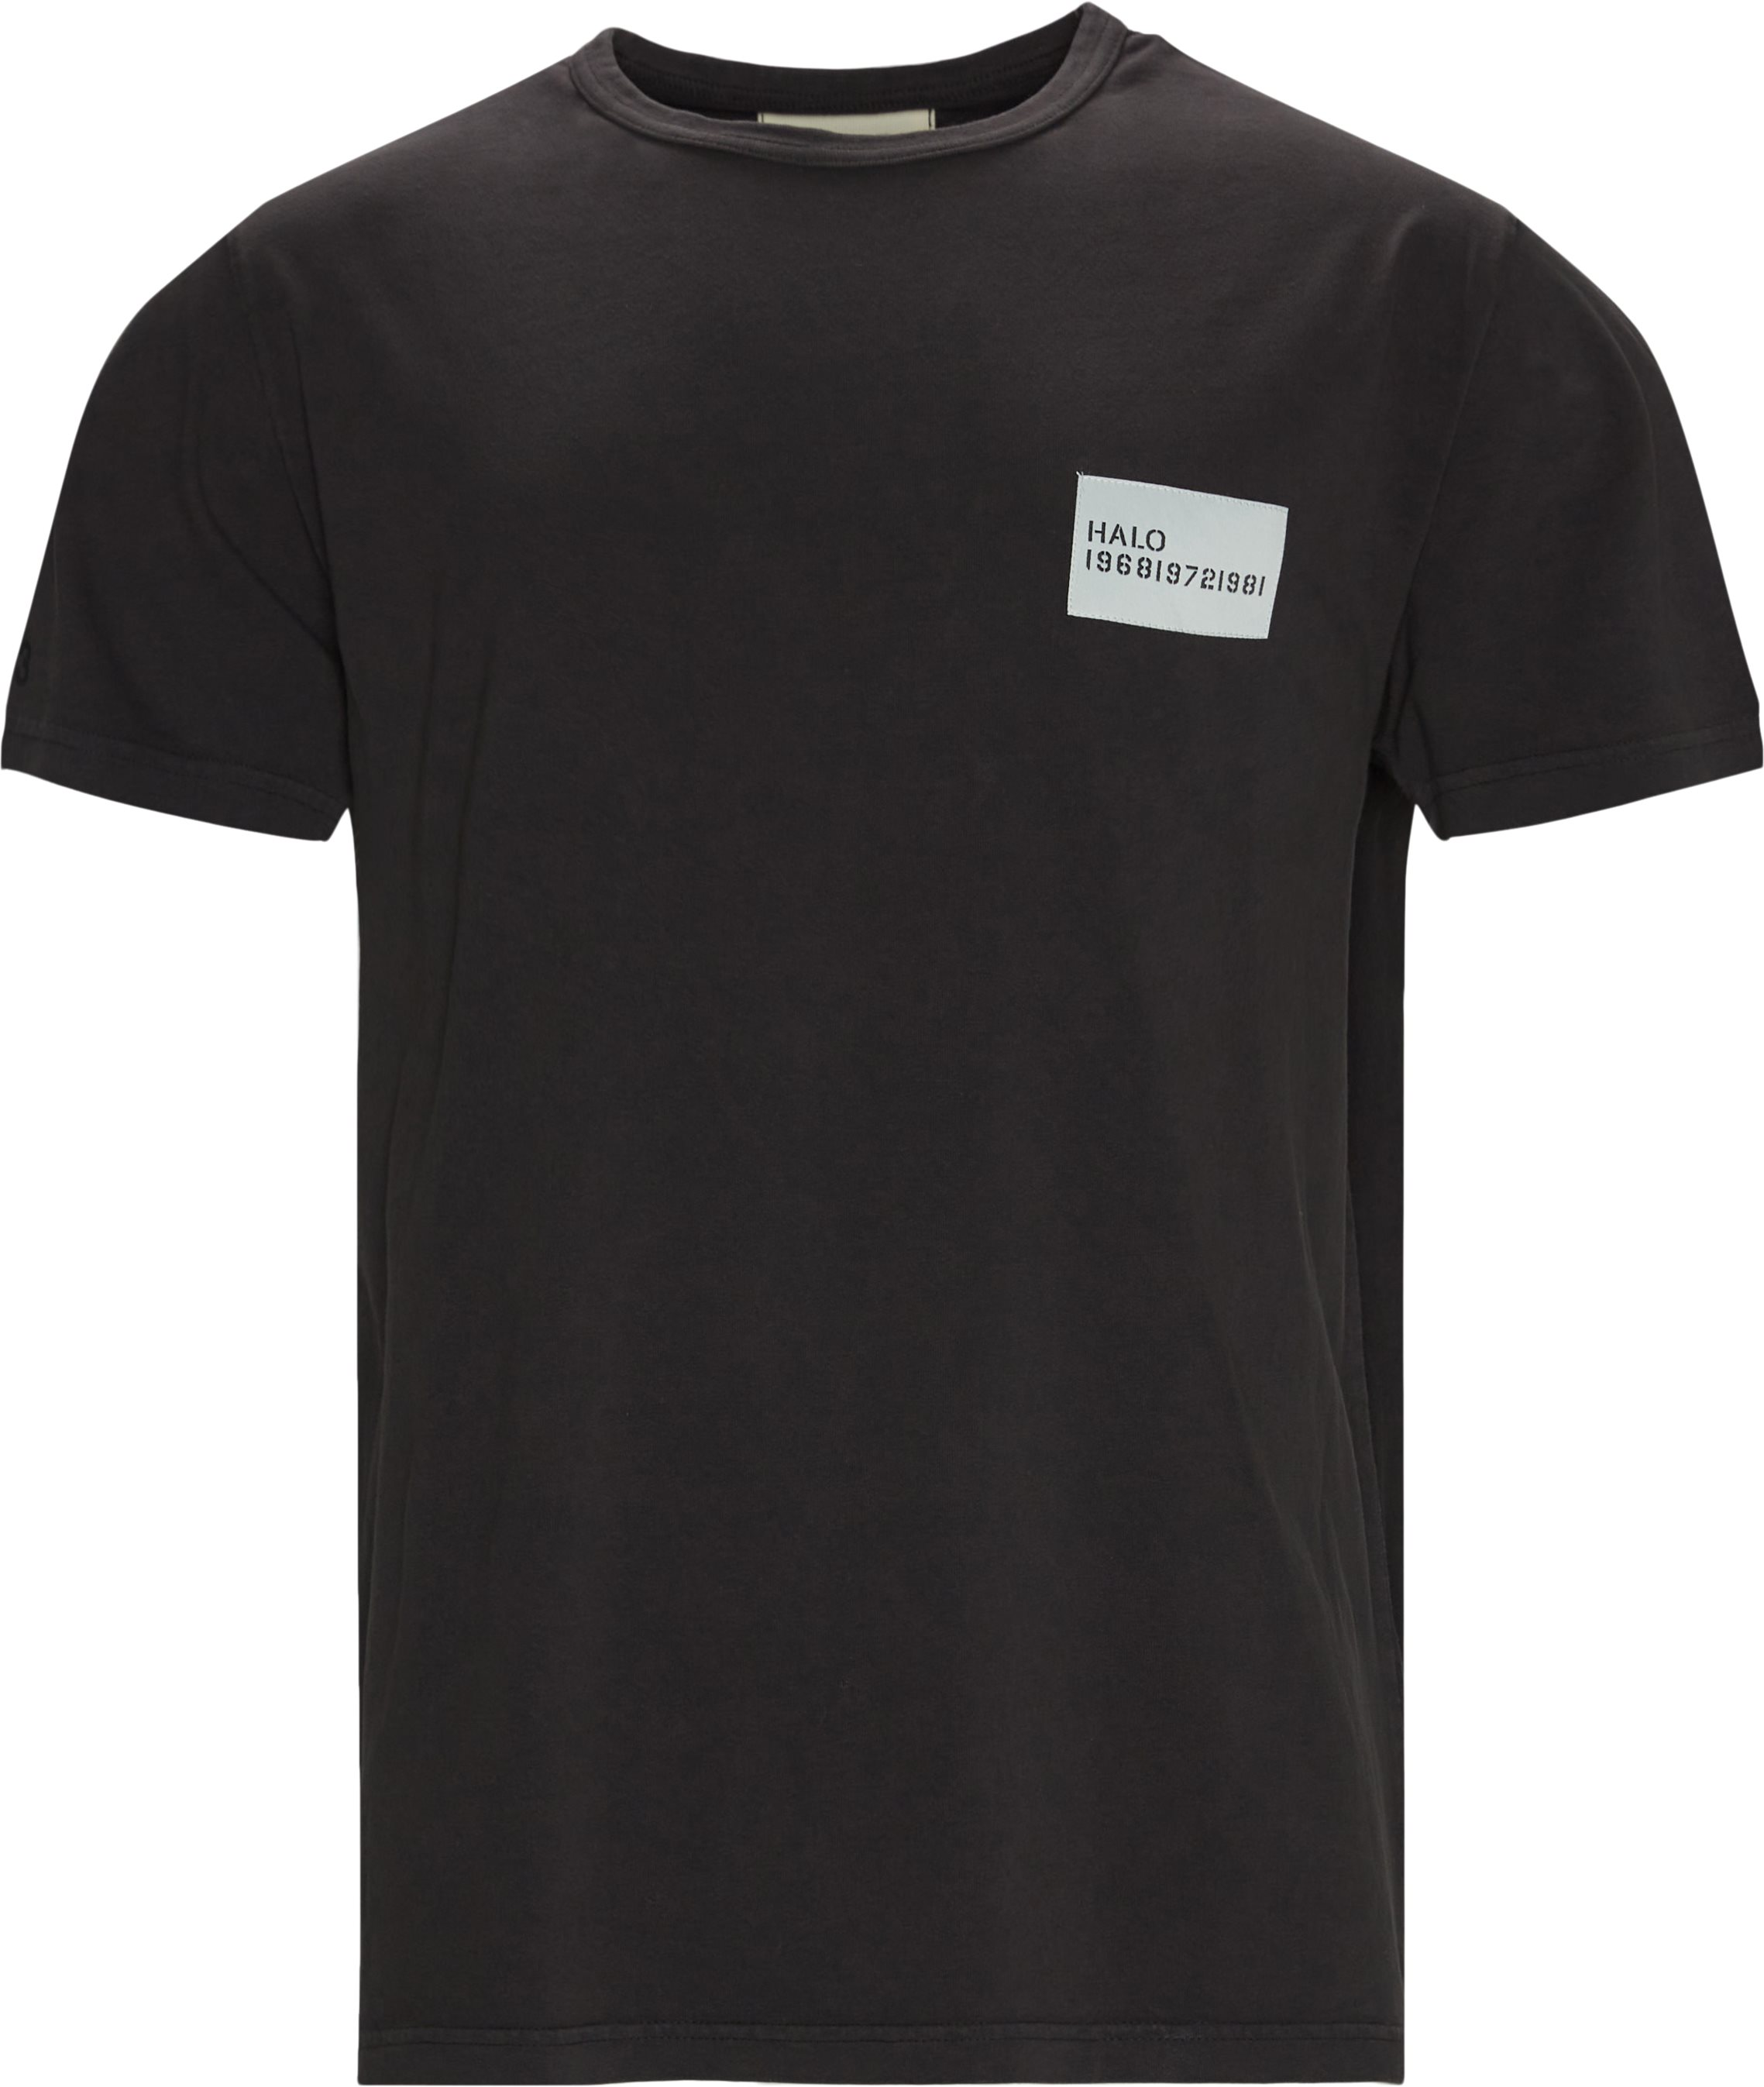 Heavy Cotton Tee - T-shirts - Regular fit - Svart